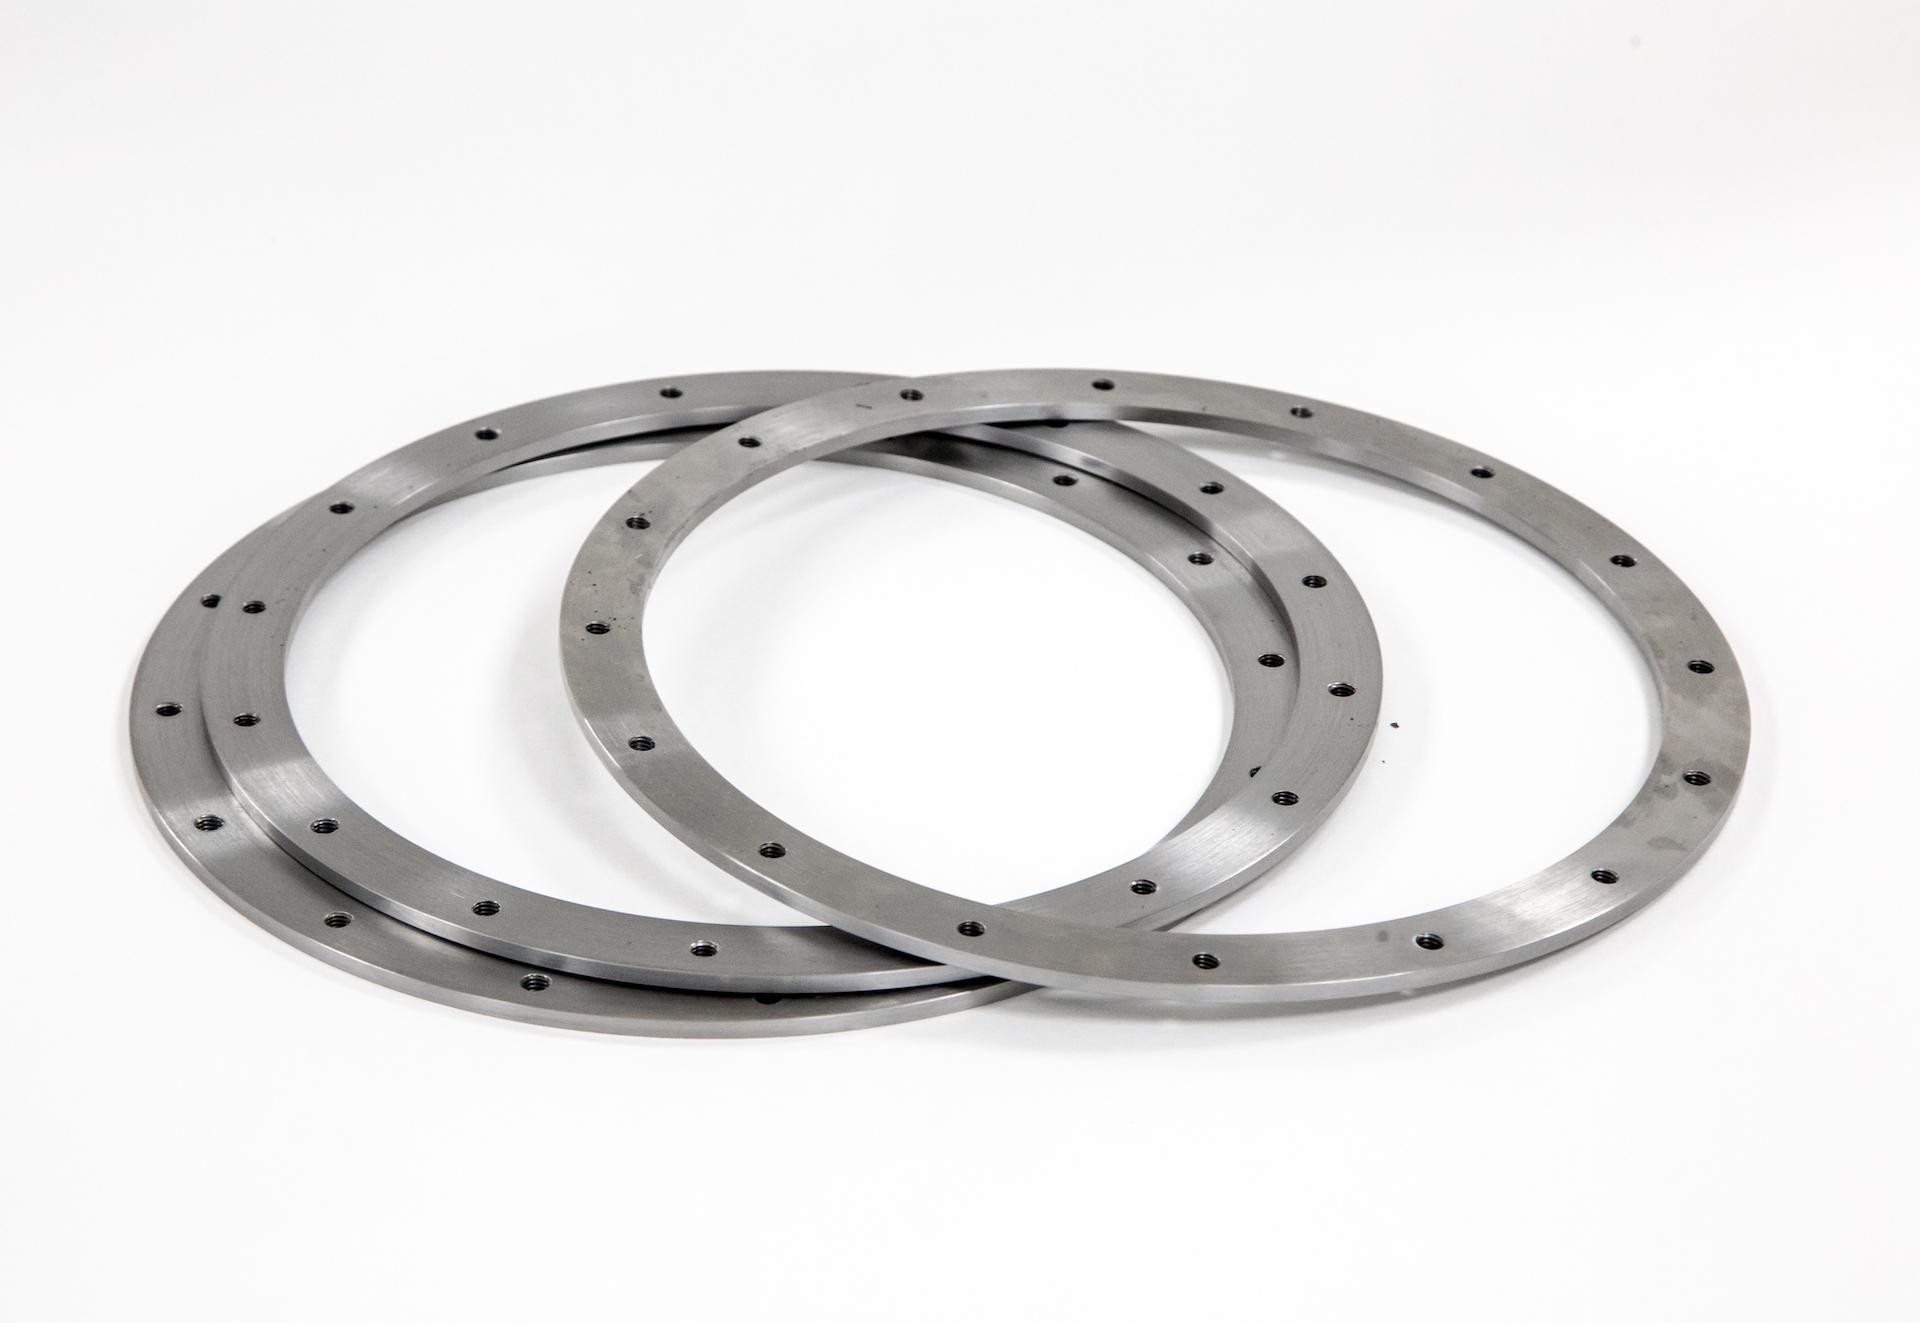 https://www.taylor-engineering.co.uk/wp-content/uploads/capabilities/turning/Doosan-400-parts.jpg